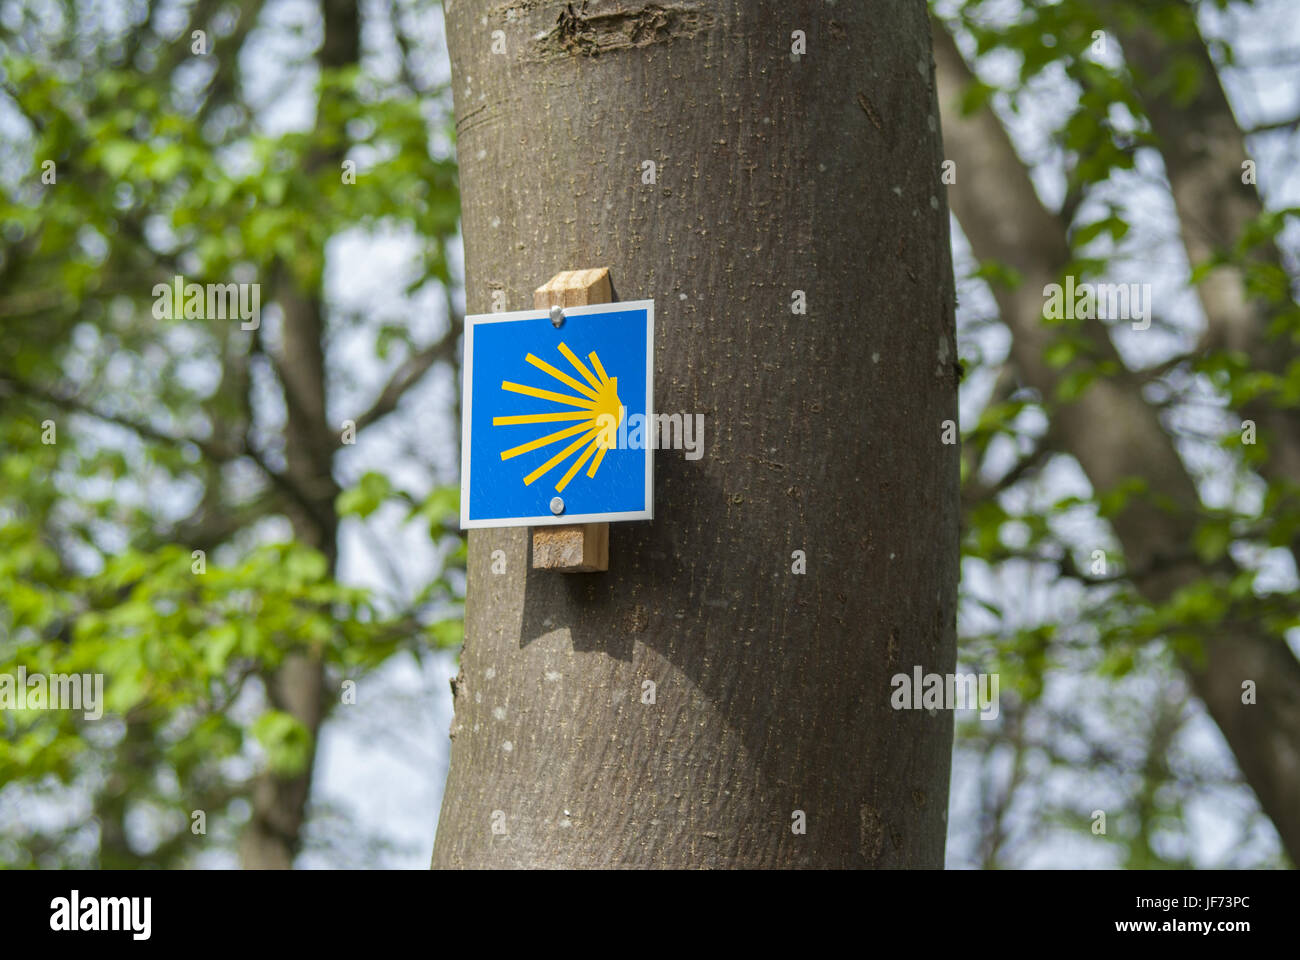 Road to Santiago, Baden-Wuerttemberg, Germany - Stock Image